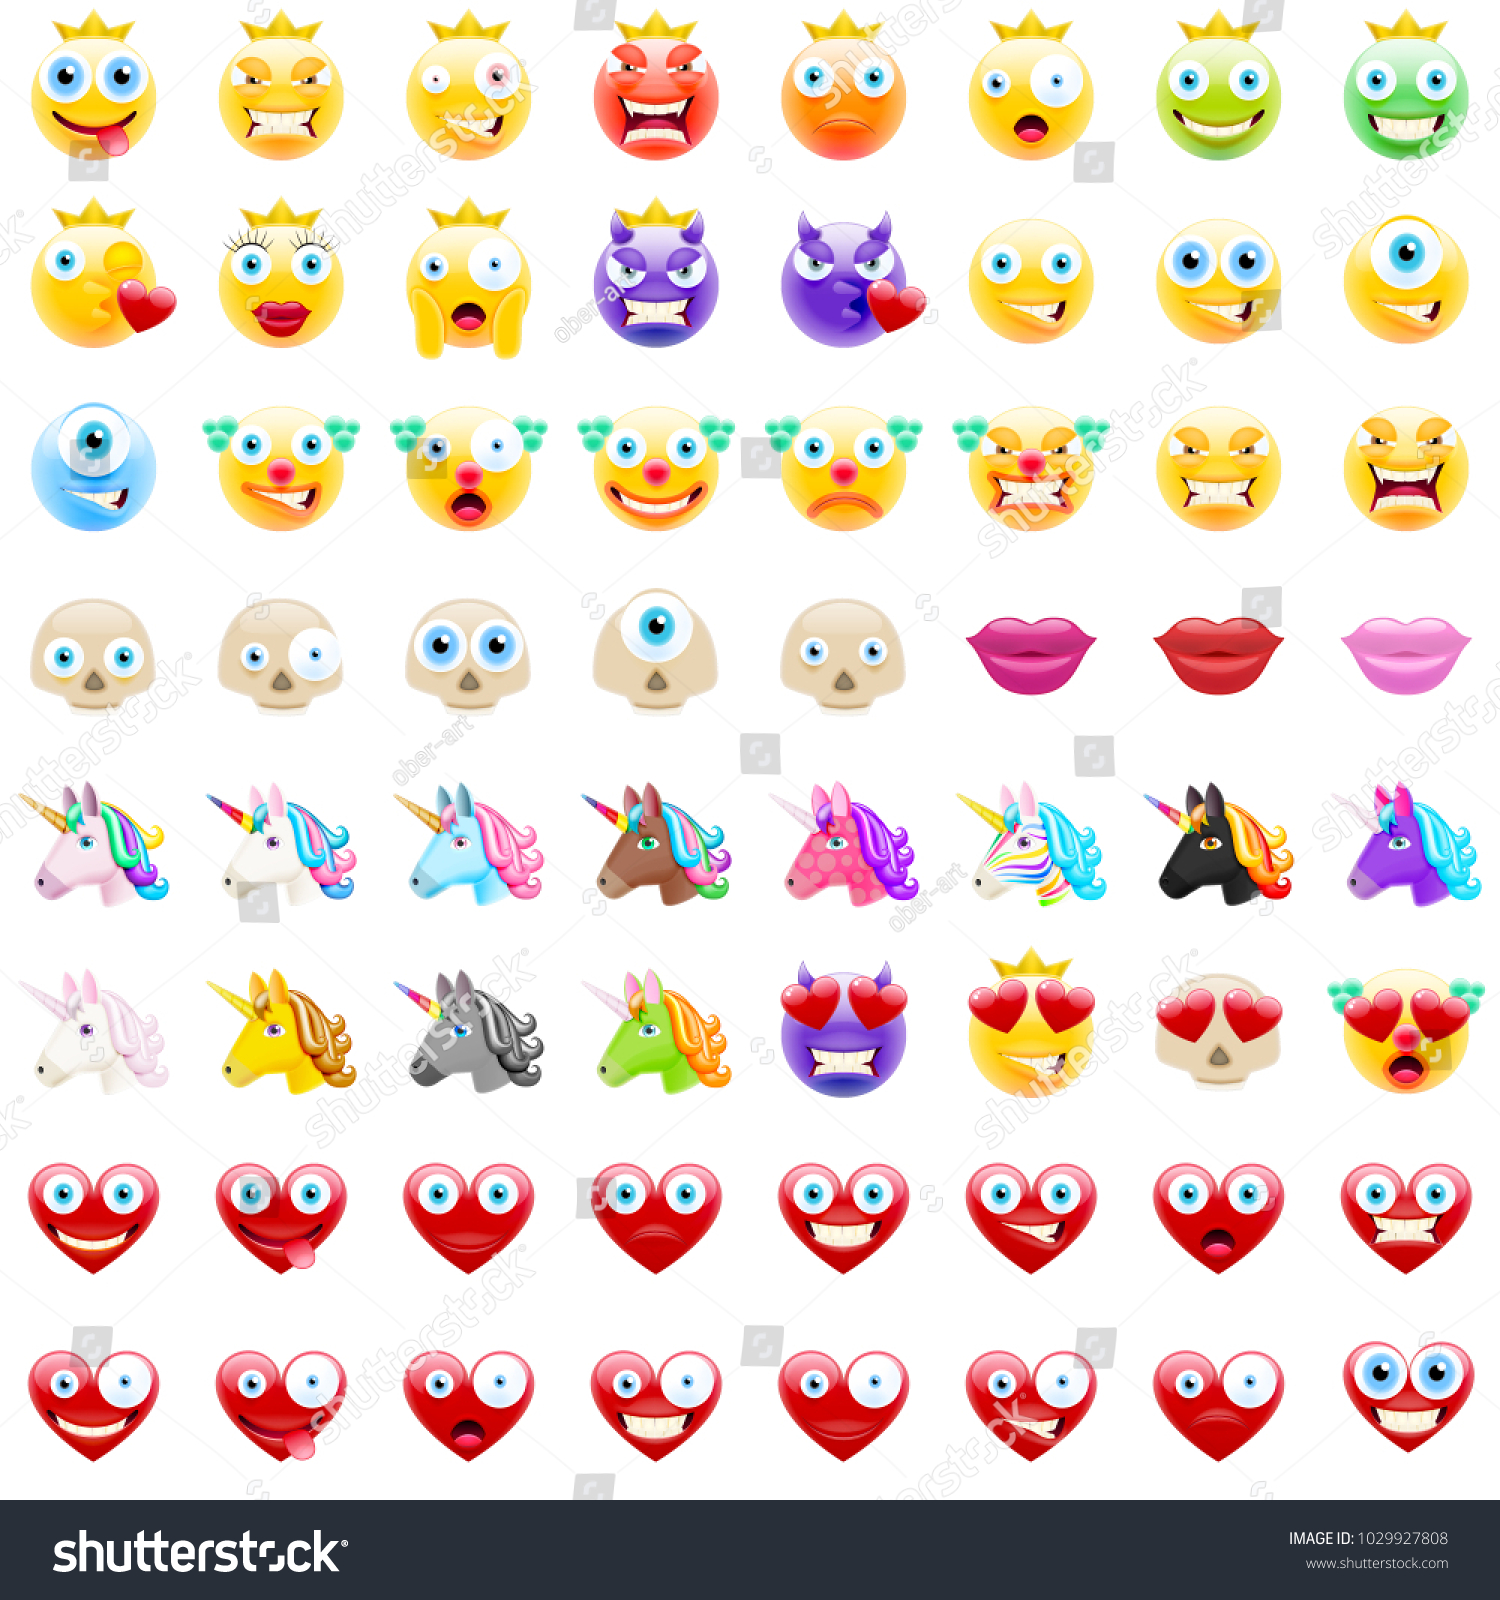 Ultimate set modern emojis emoticons realistic stock vector ultimate set of modern emojis emoticons realistic vector illustration symbols variety of emotions biocorpaavc Gallery